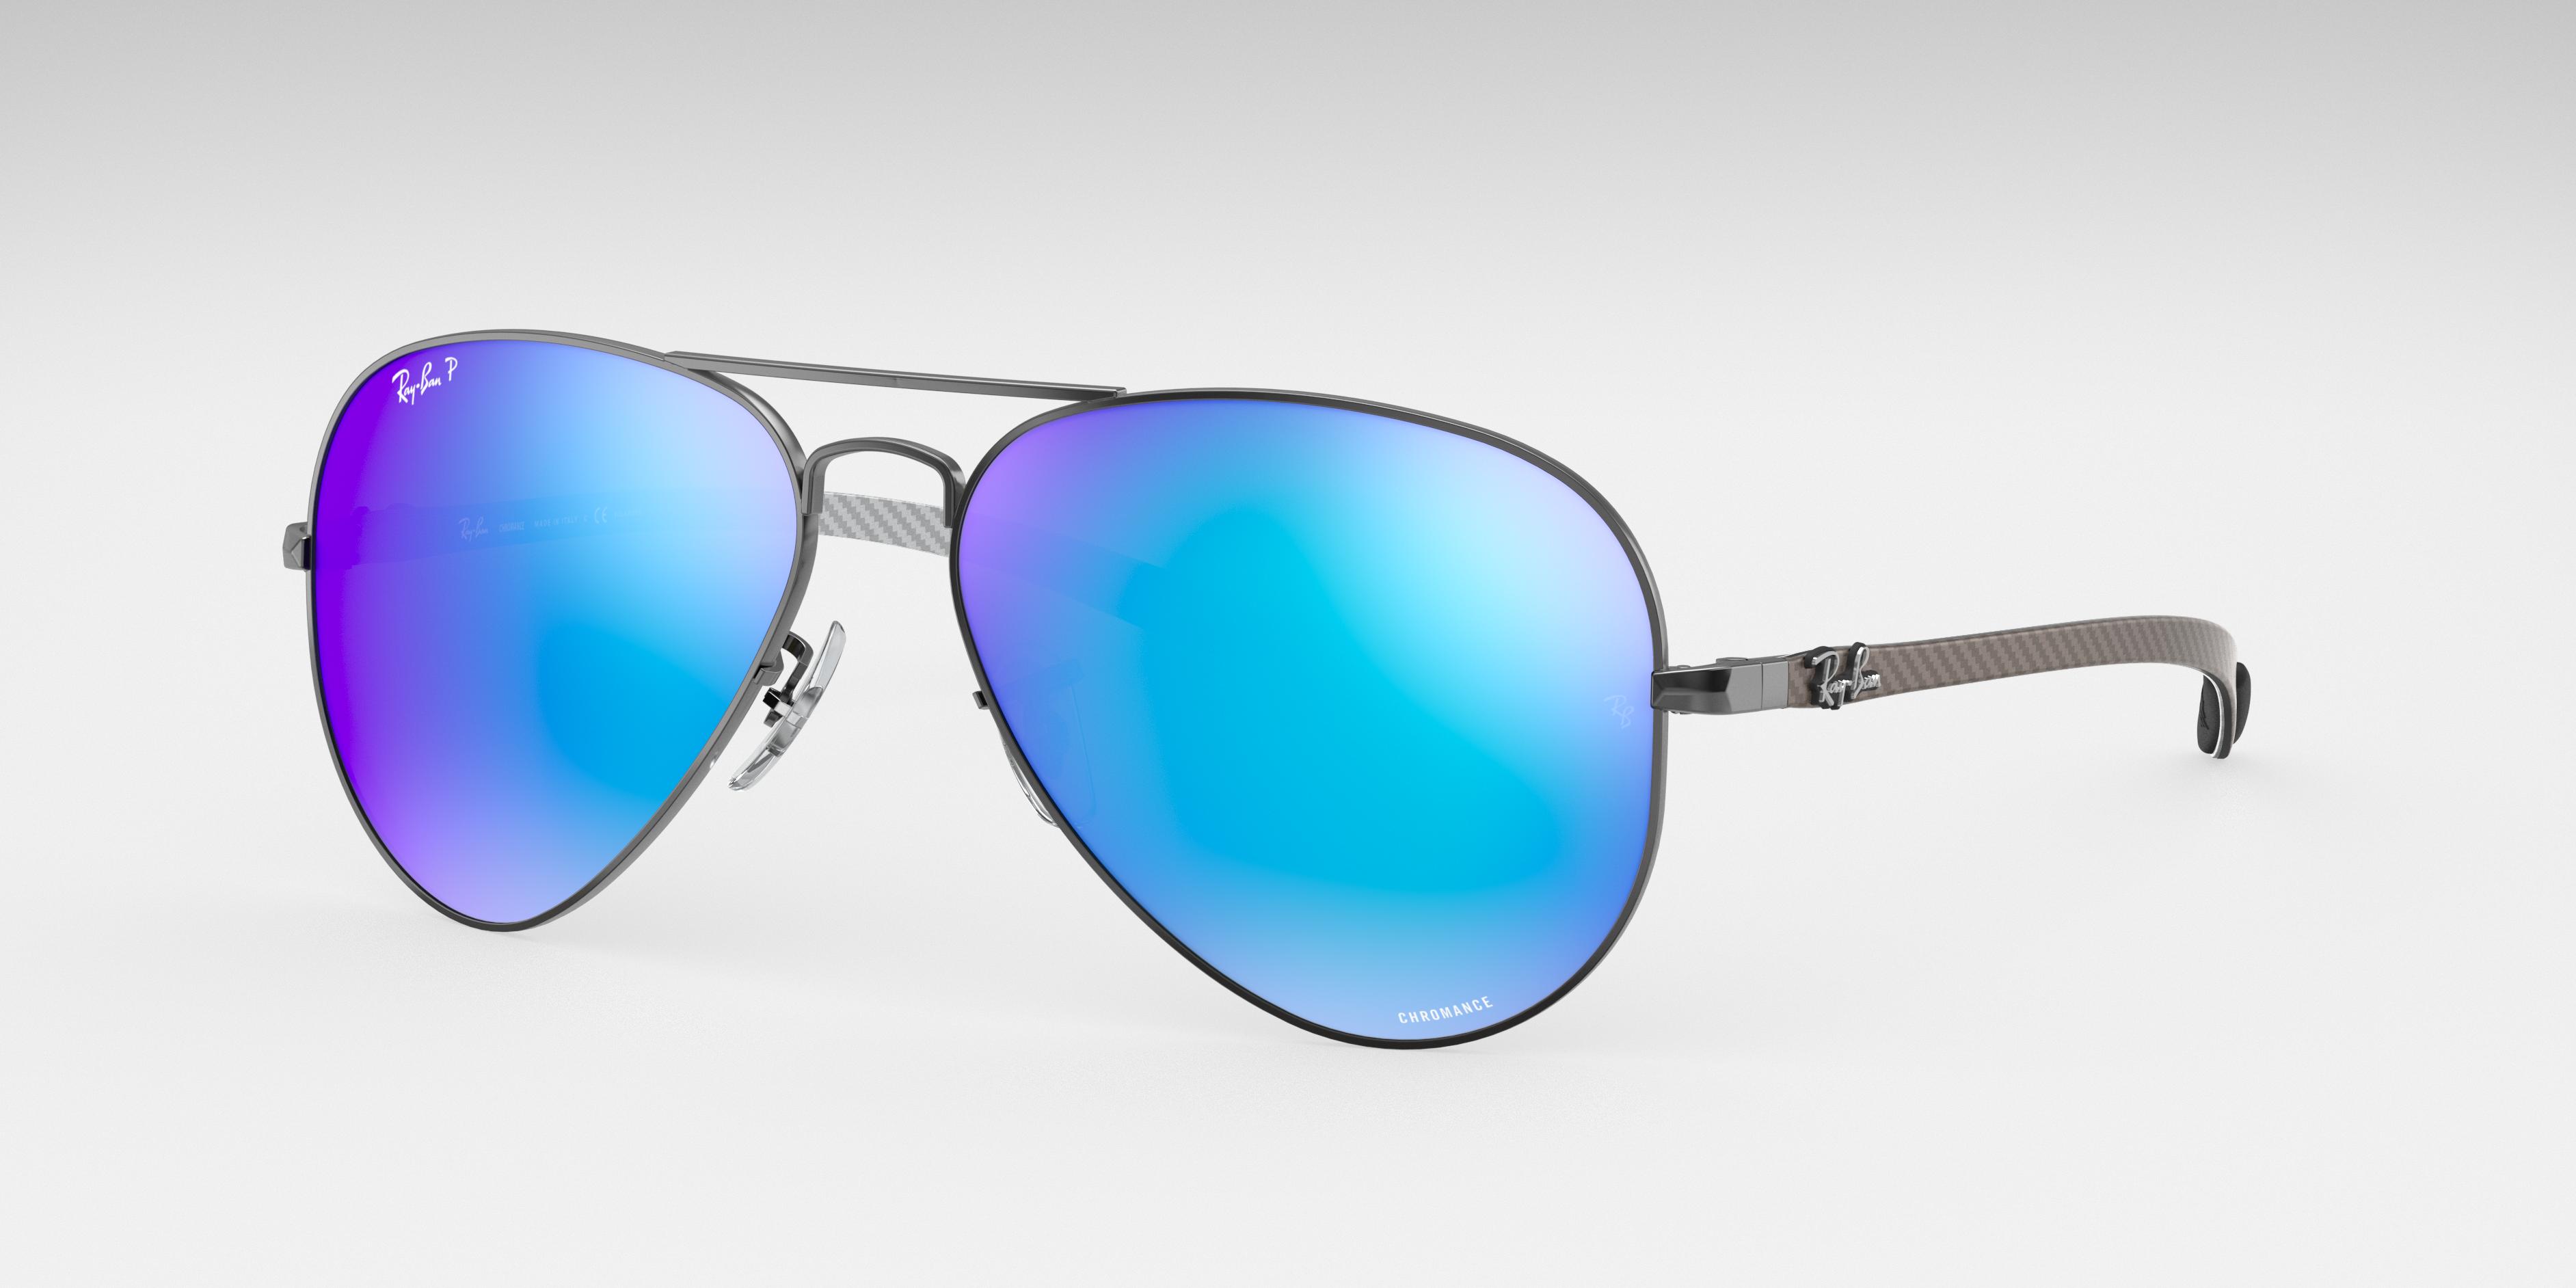 Ray-Ban Rb8317 Chromance Gunmetal, Polarized Blue Lenses - RB8317CH